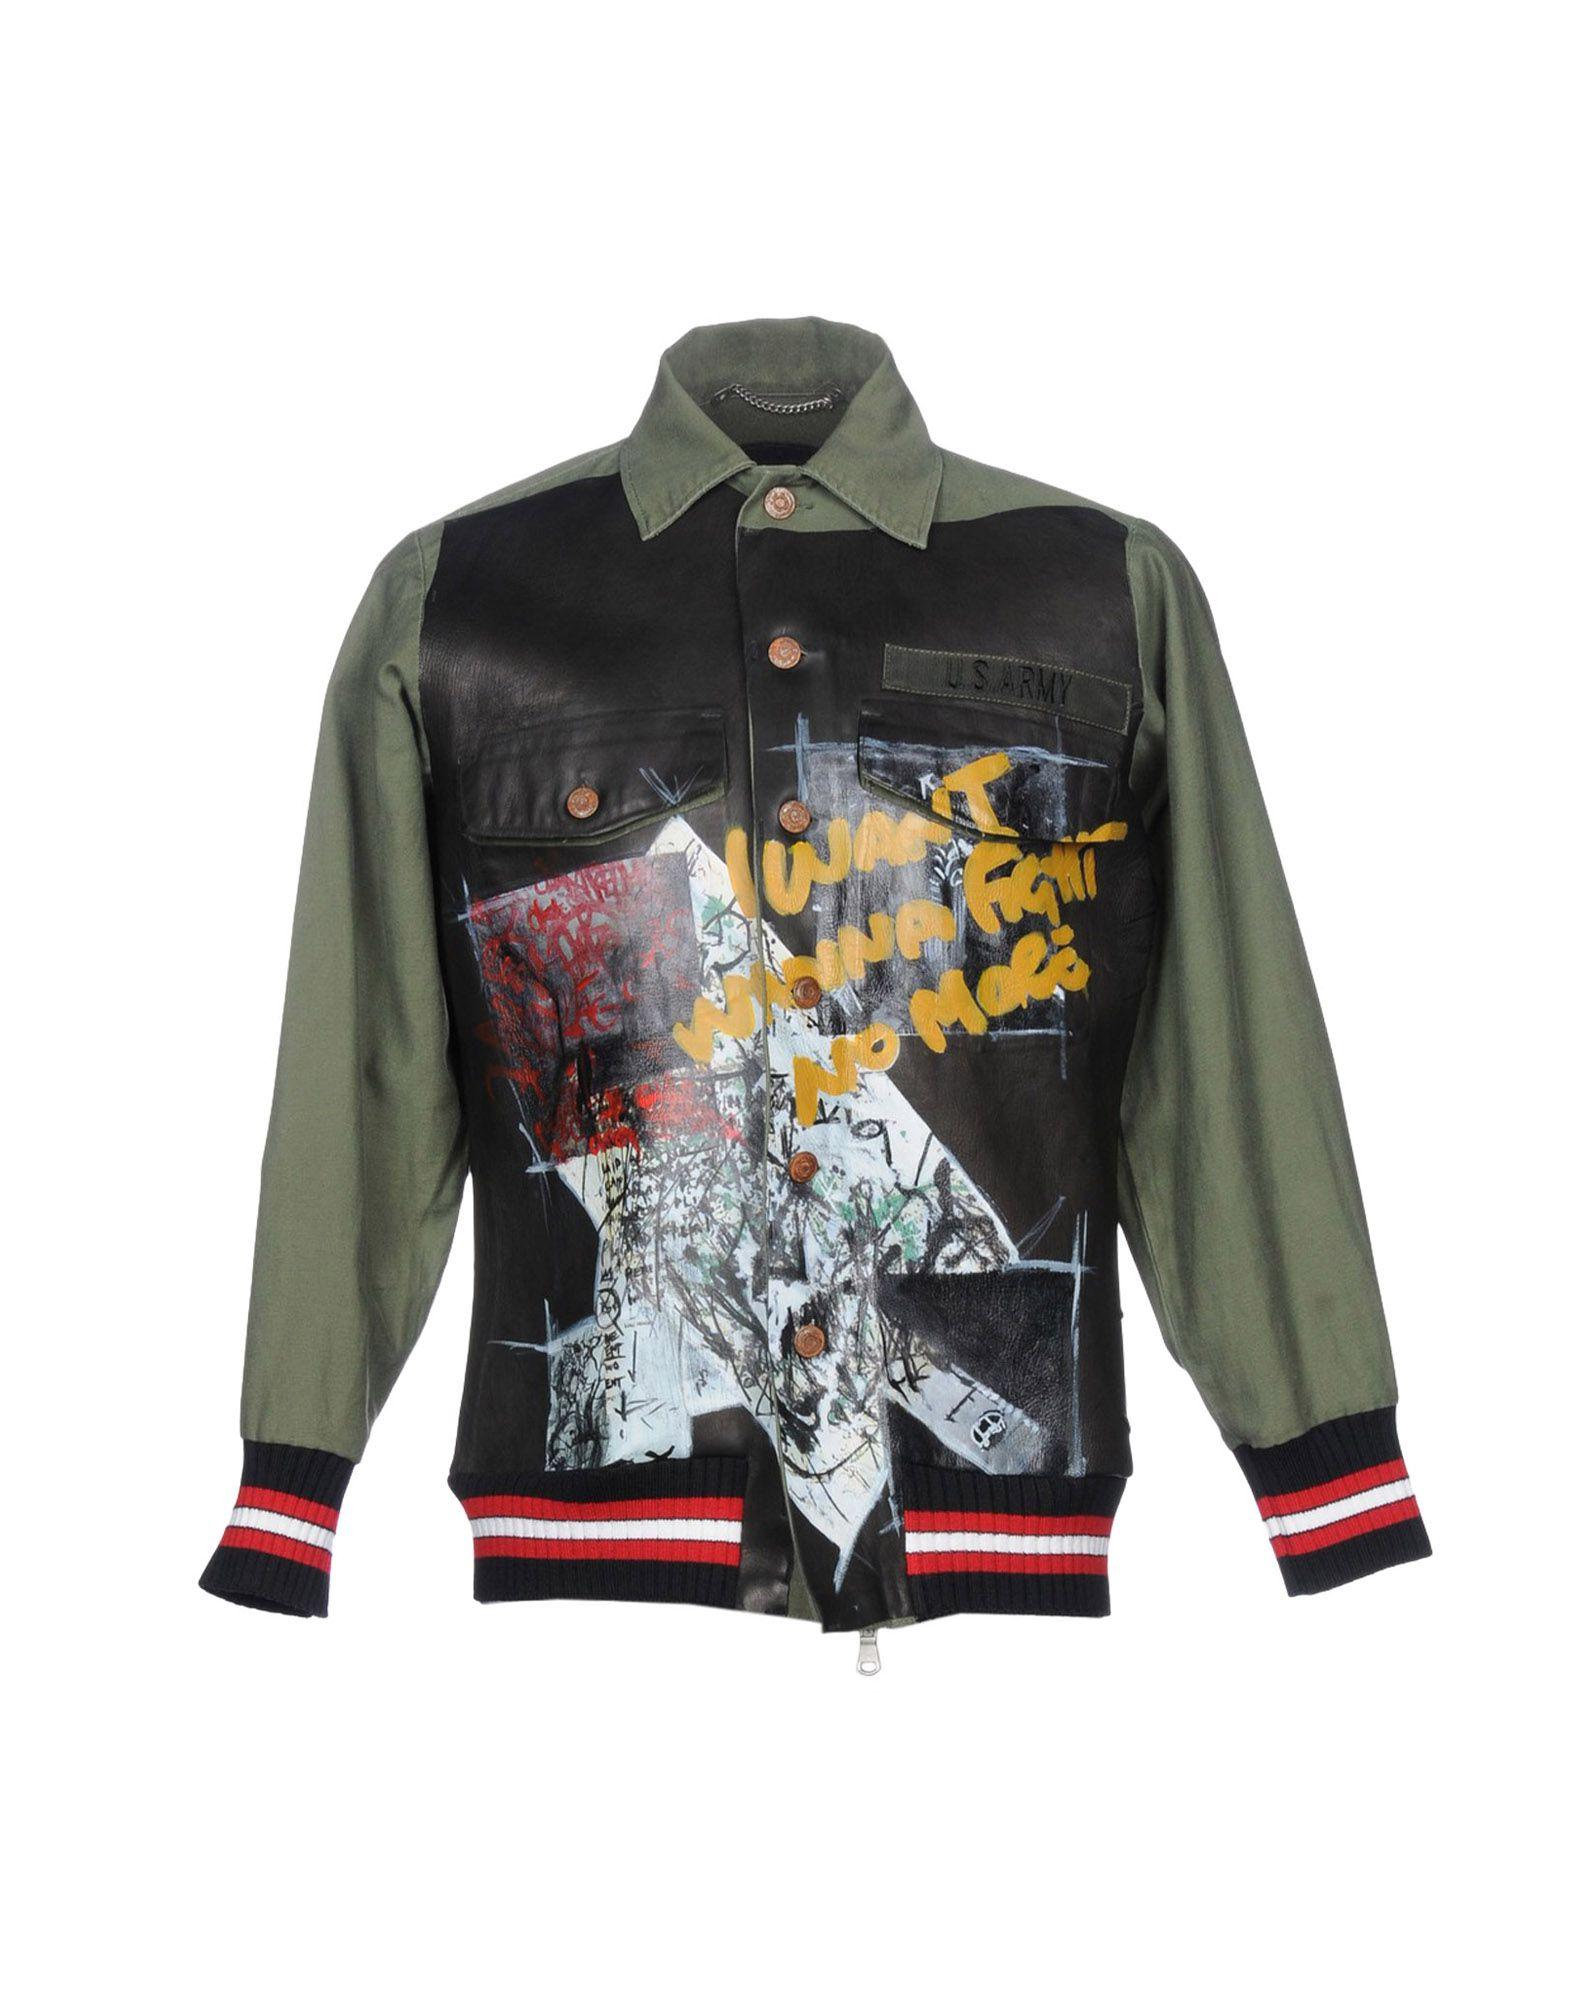 PIHAKAPI Jacket in Military Green